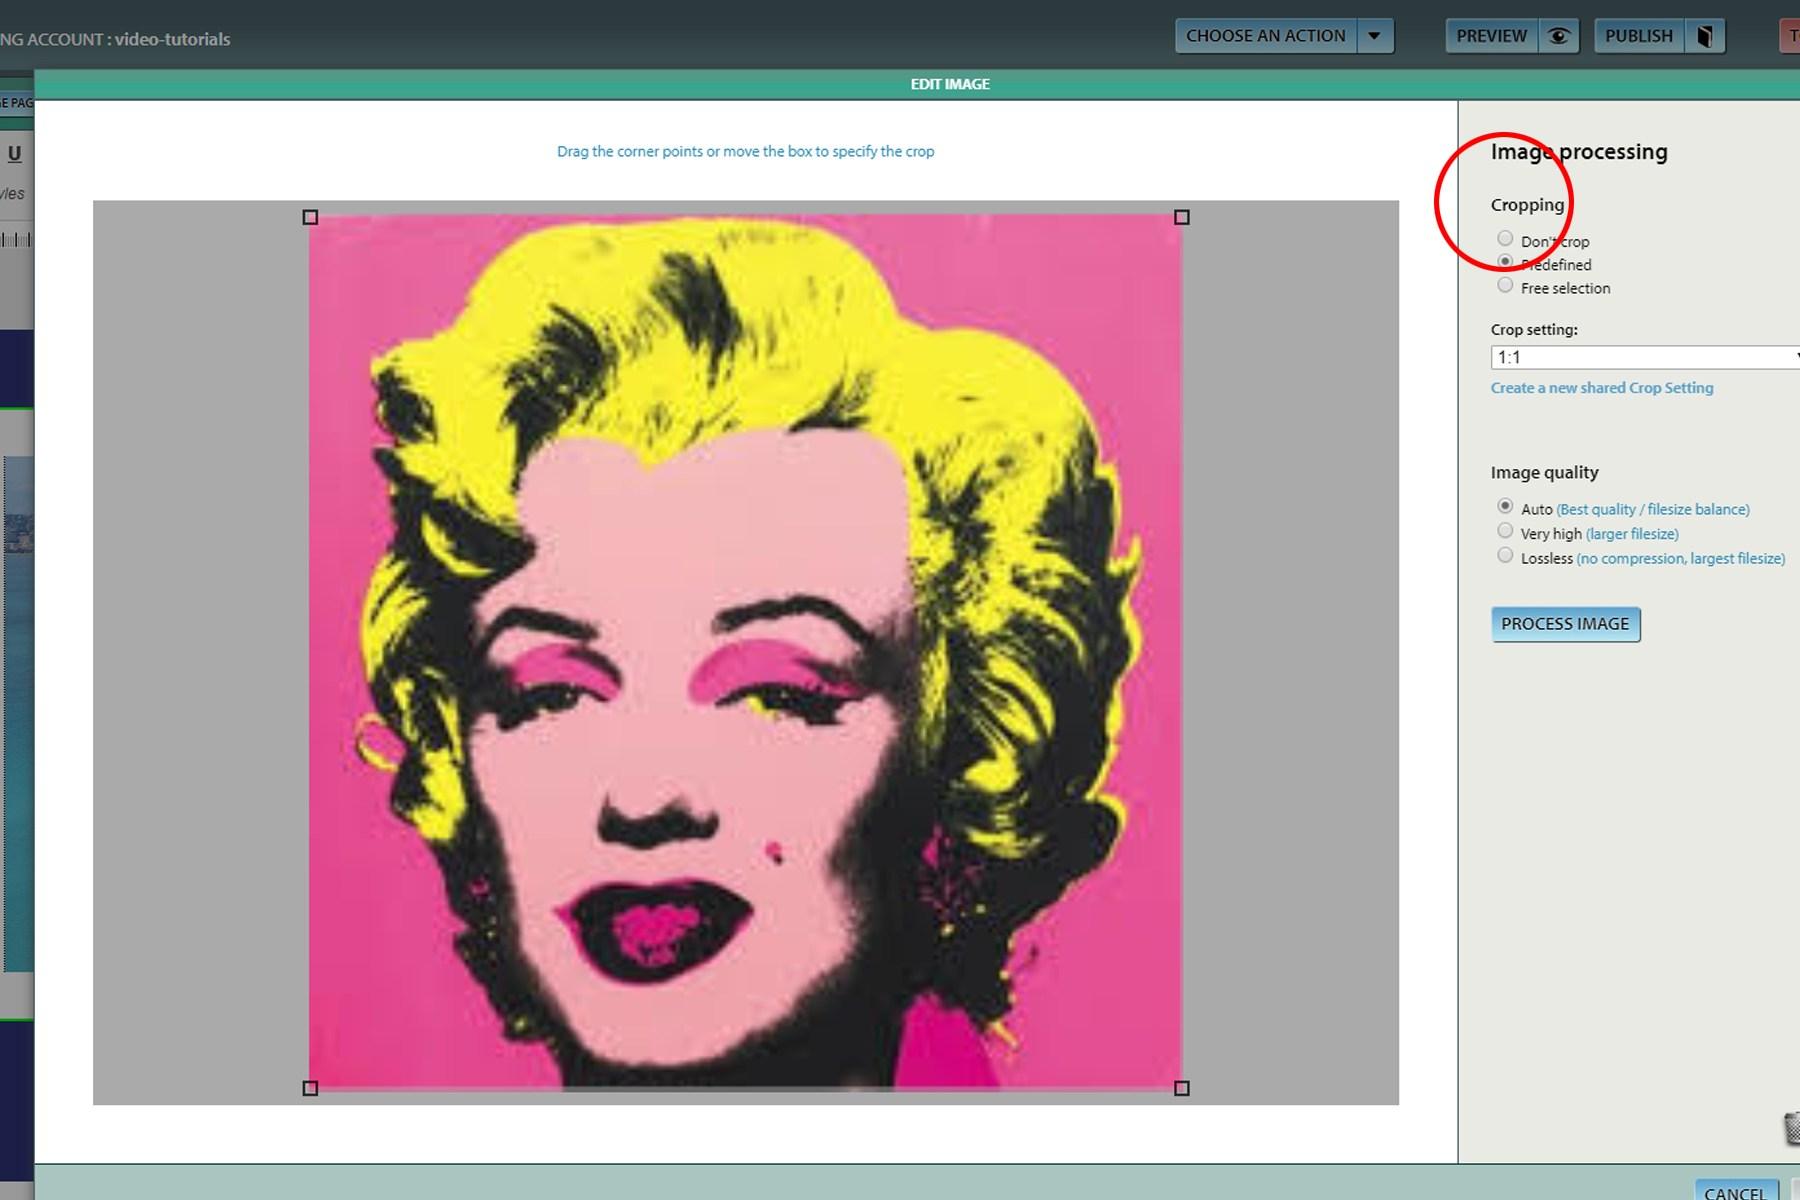 Image Processing - Cropping image